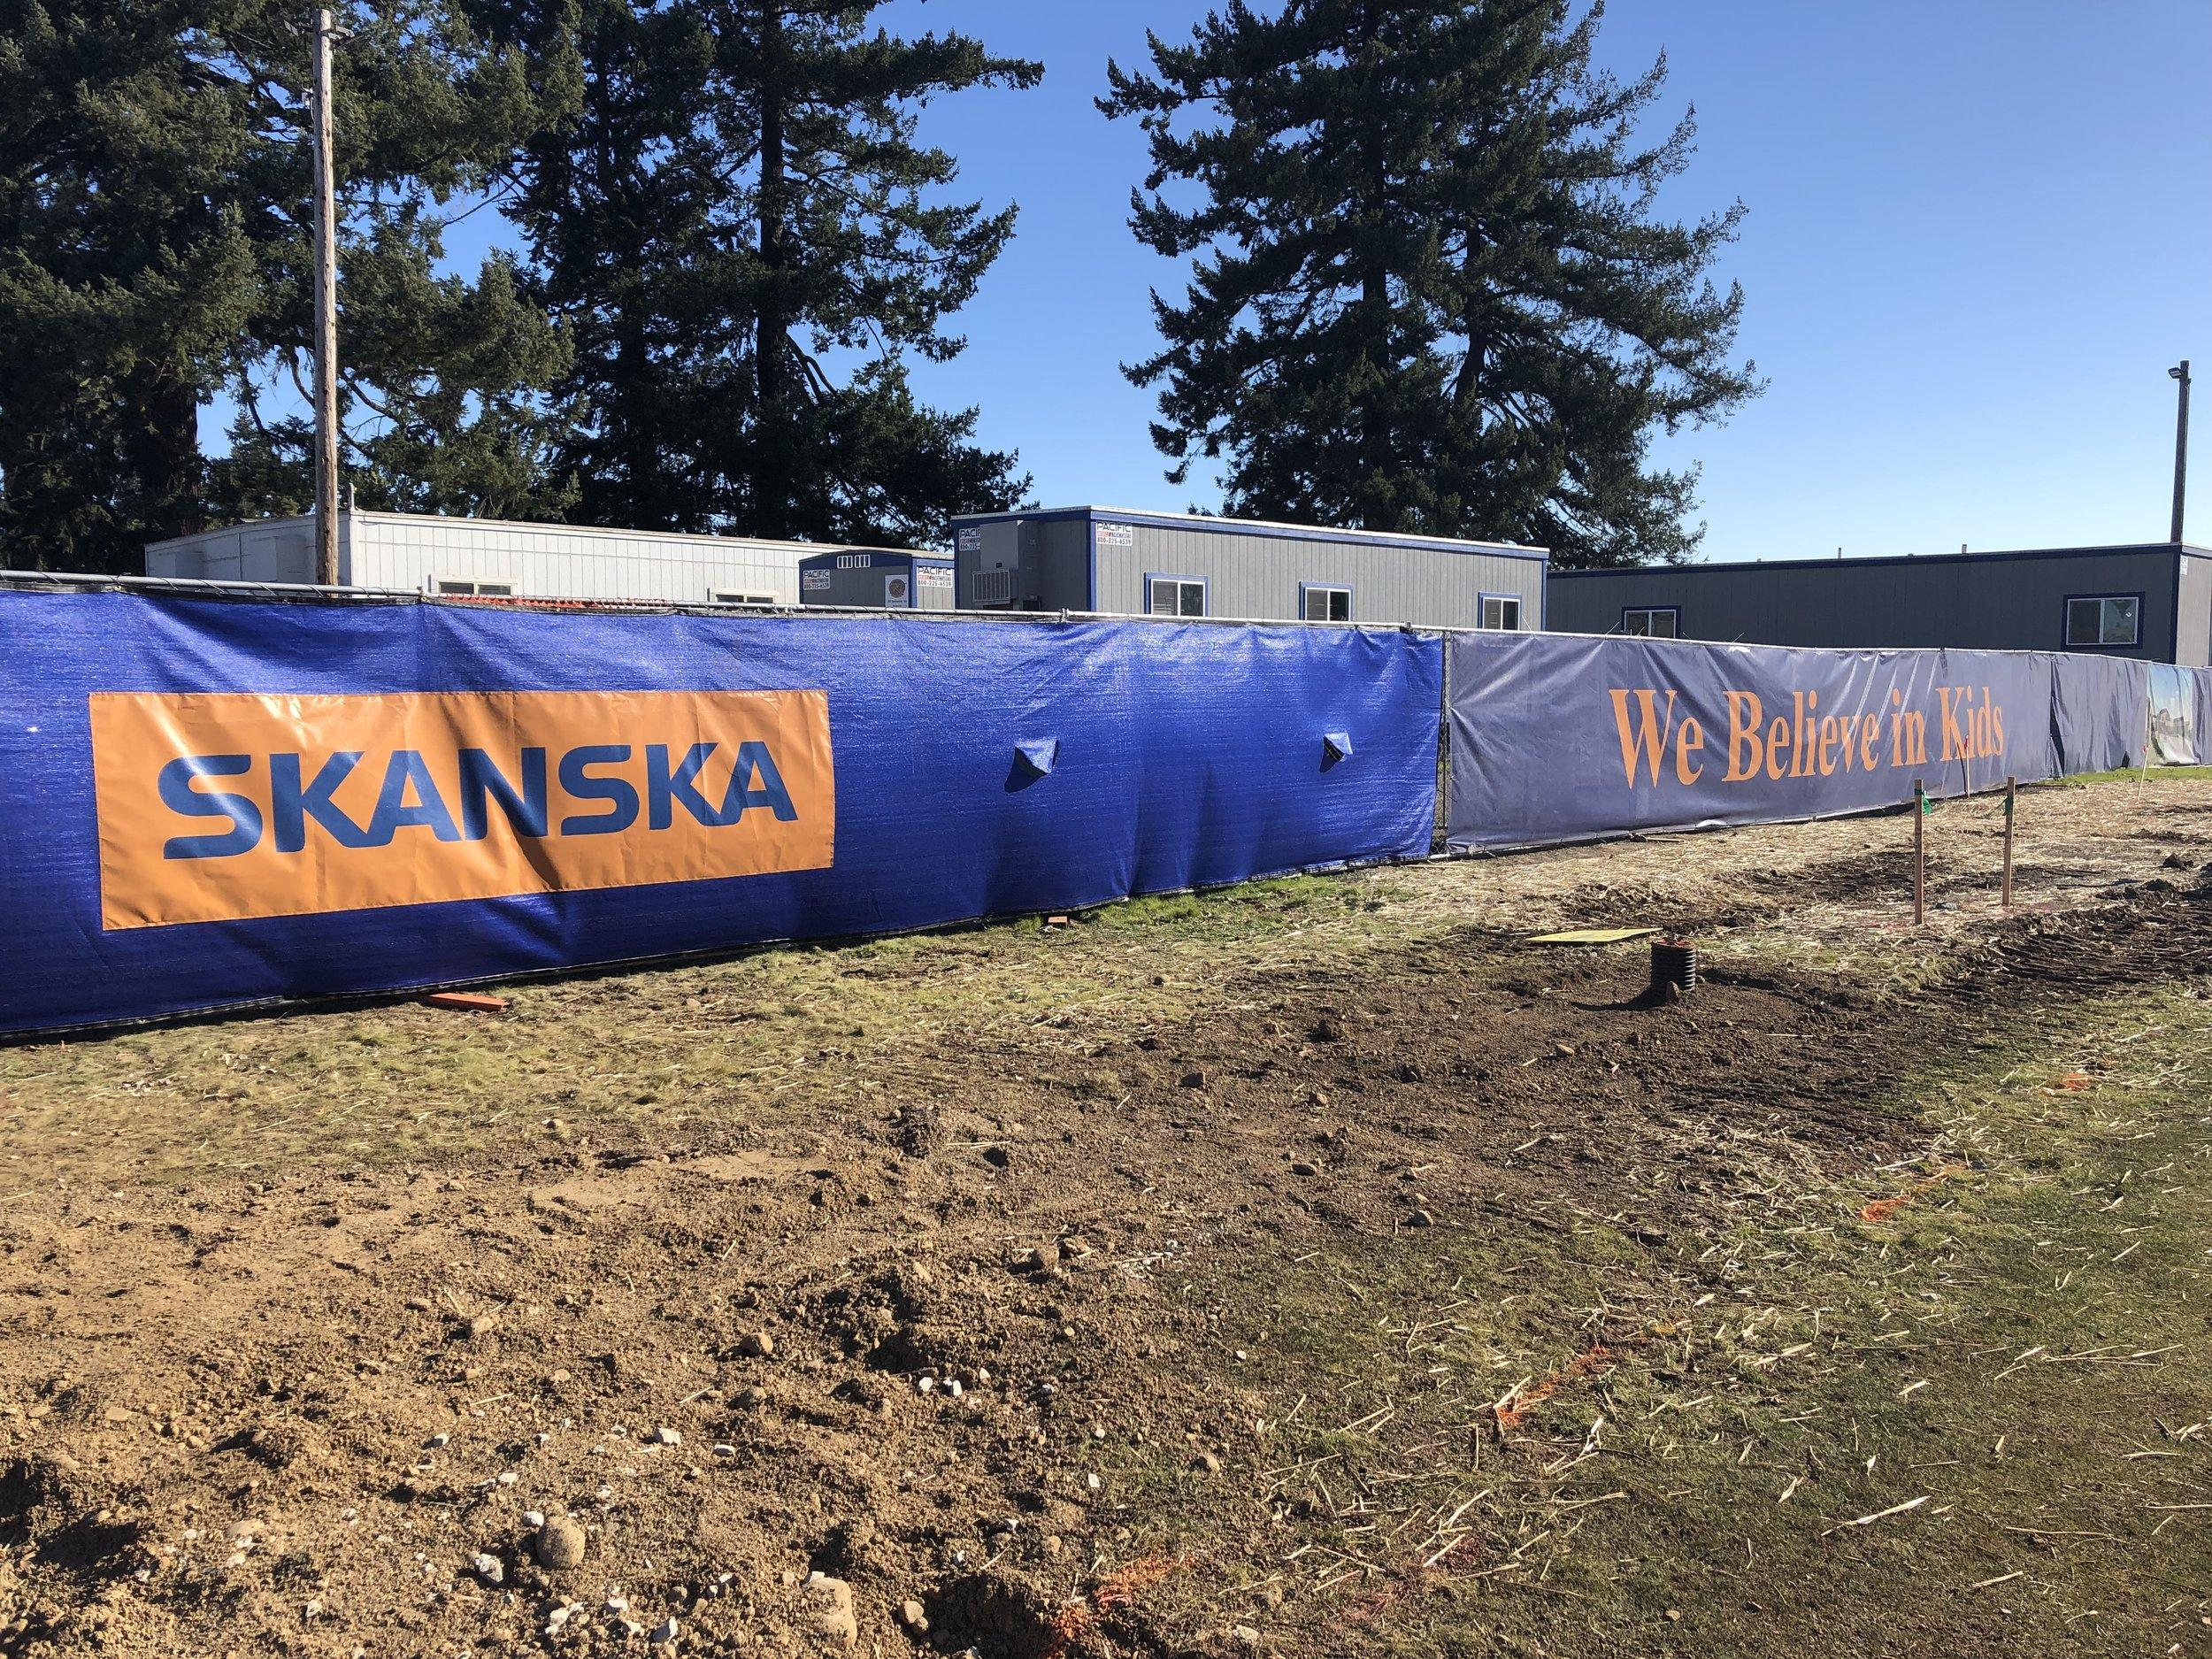 2019 WIC Wk Skanska site tour.JPG